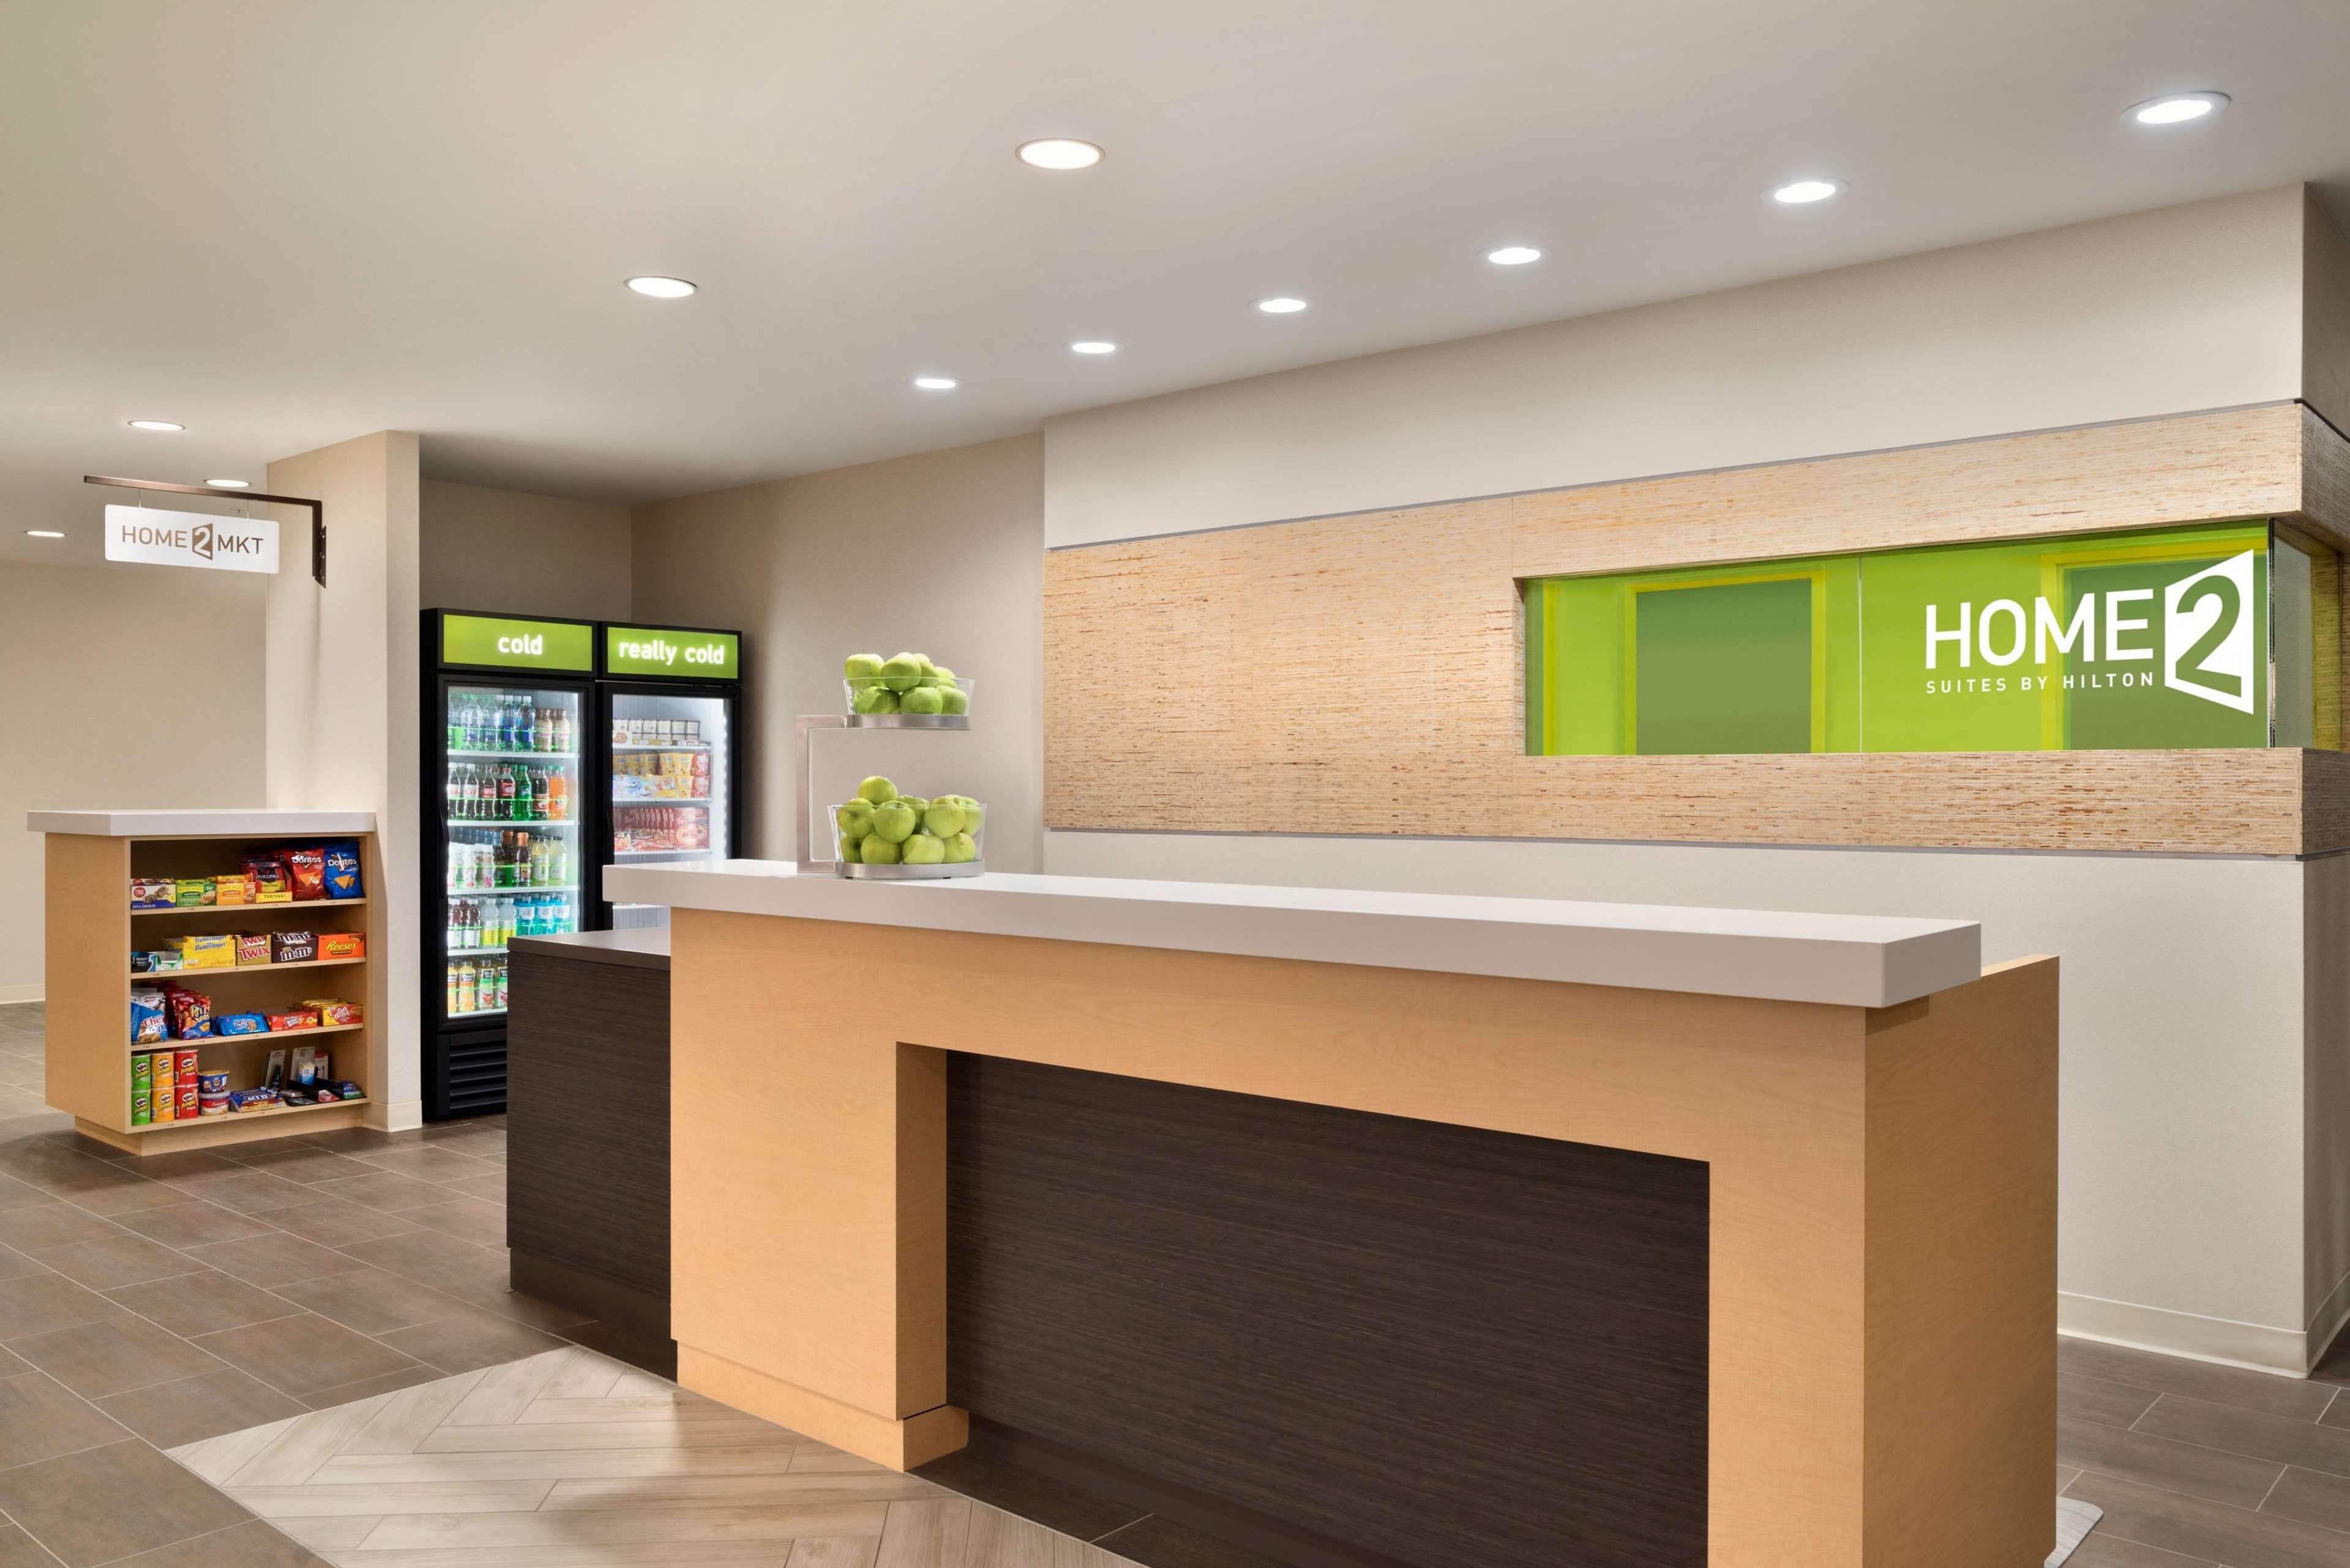 Home2 Suites by Hilton Leavenworth Downtown image 5